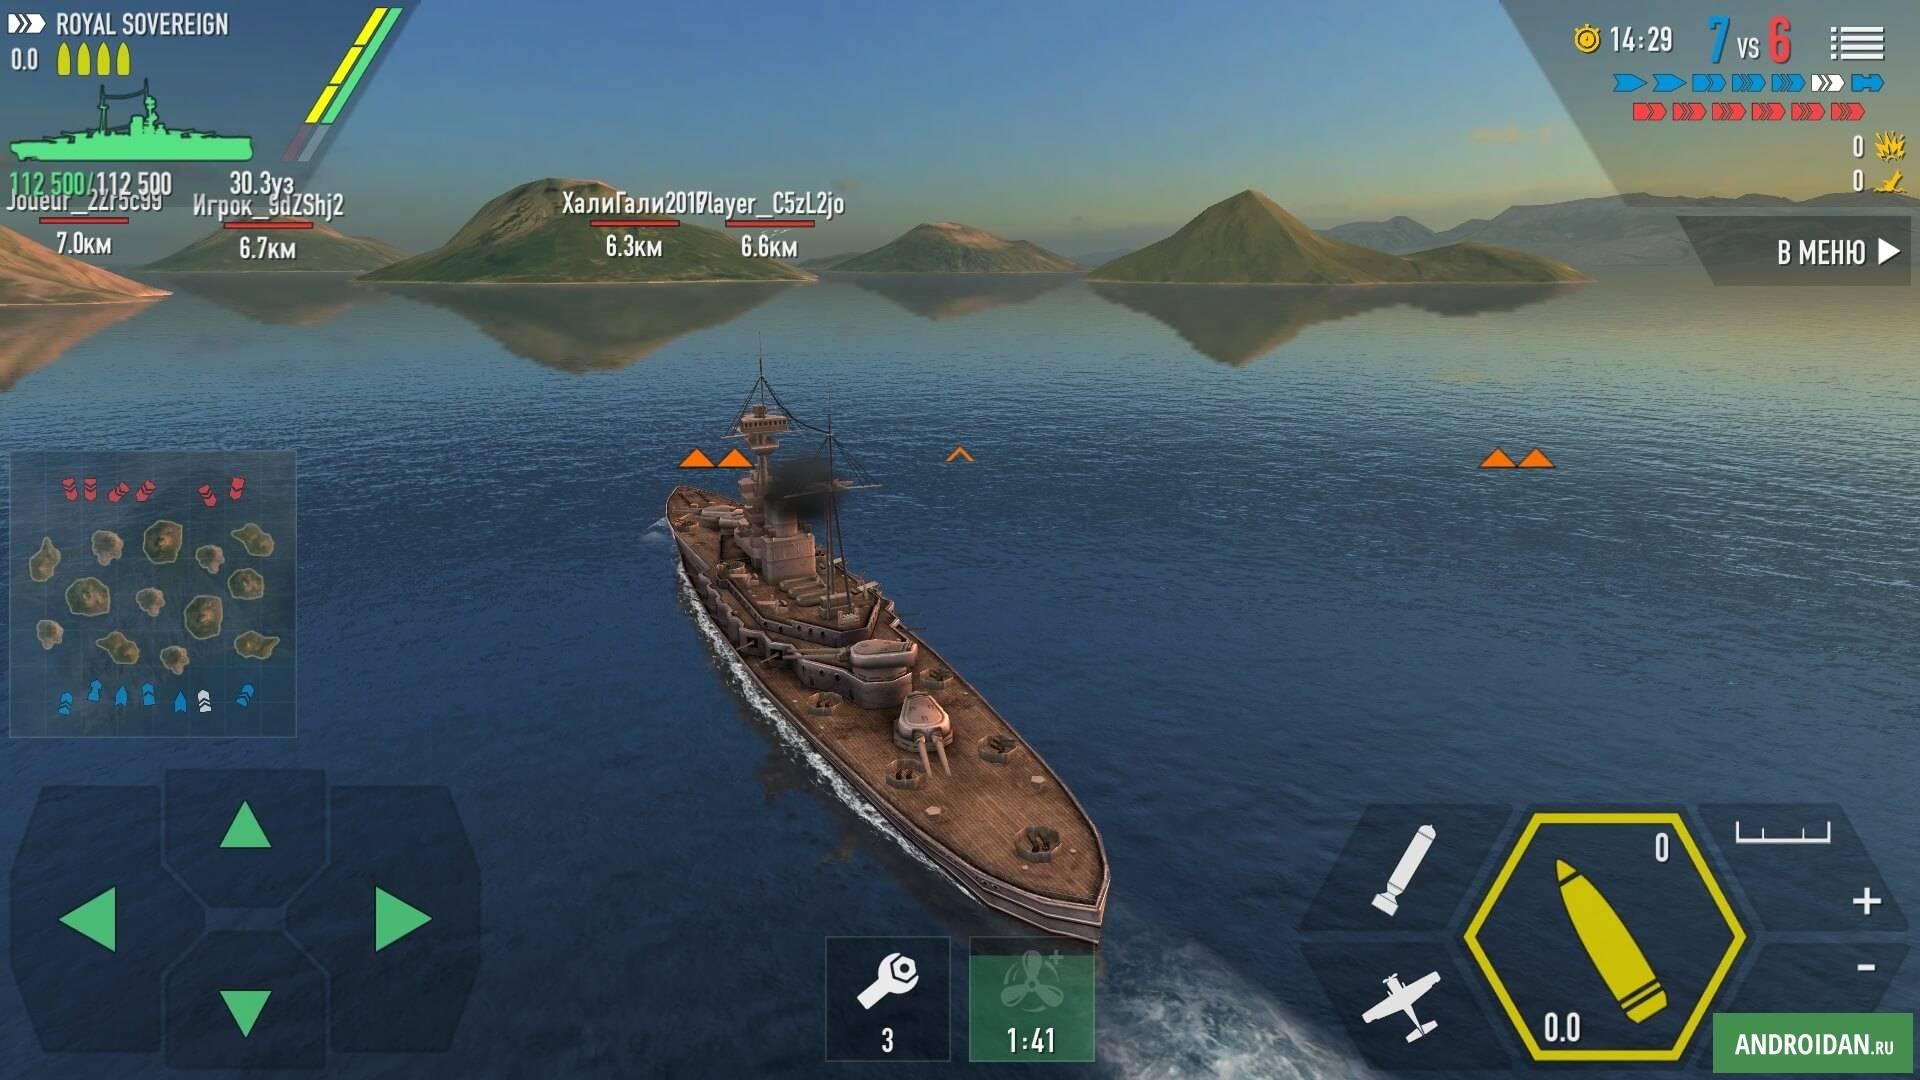 Warship battle коды на андроид буду